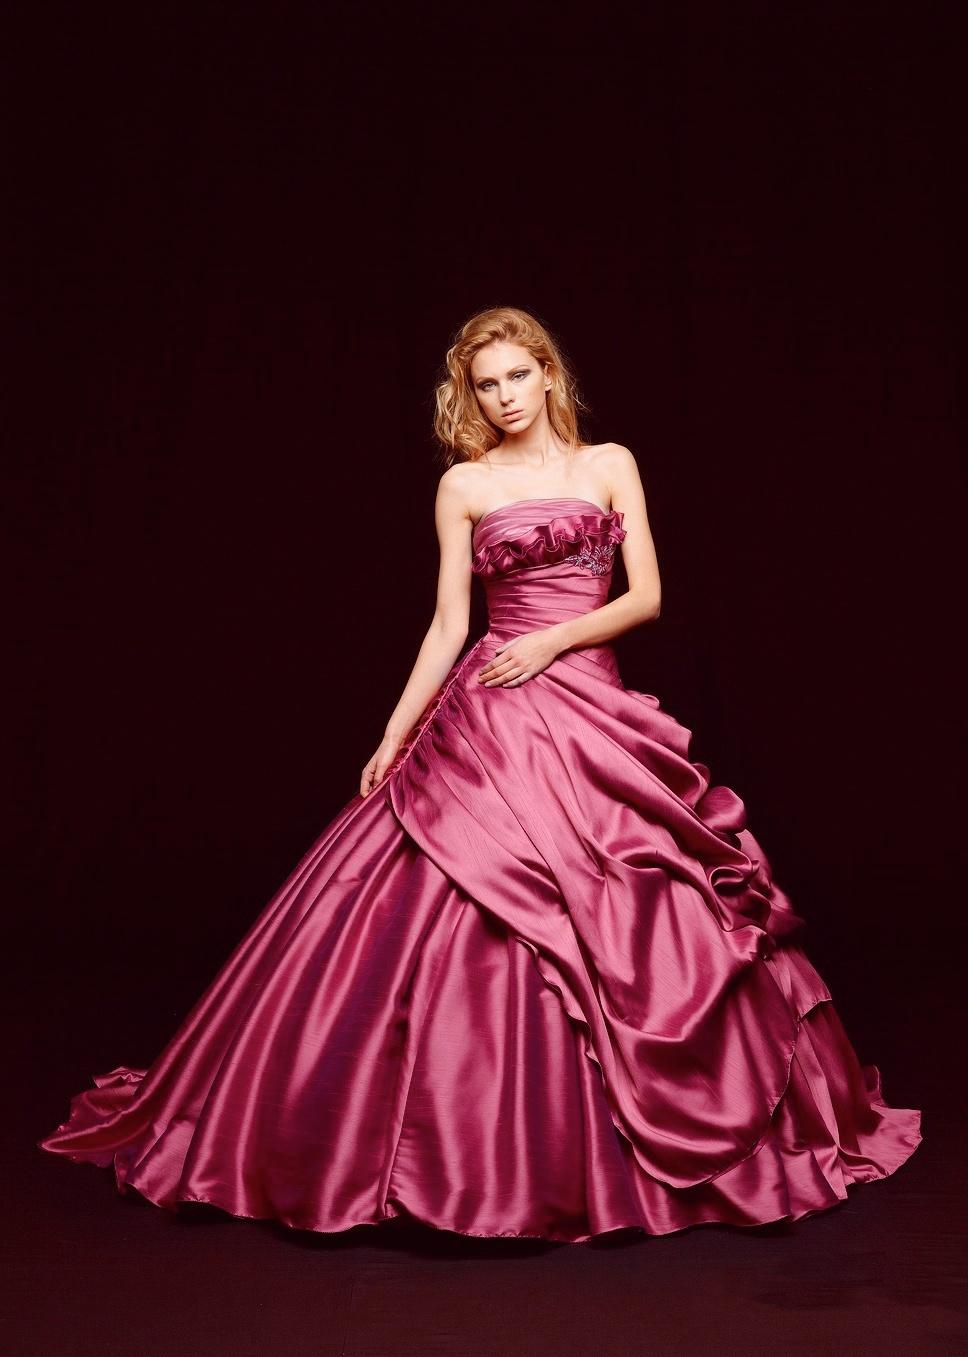 brilliant pink【1】